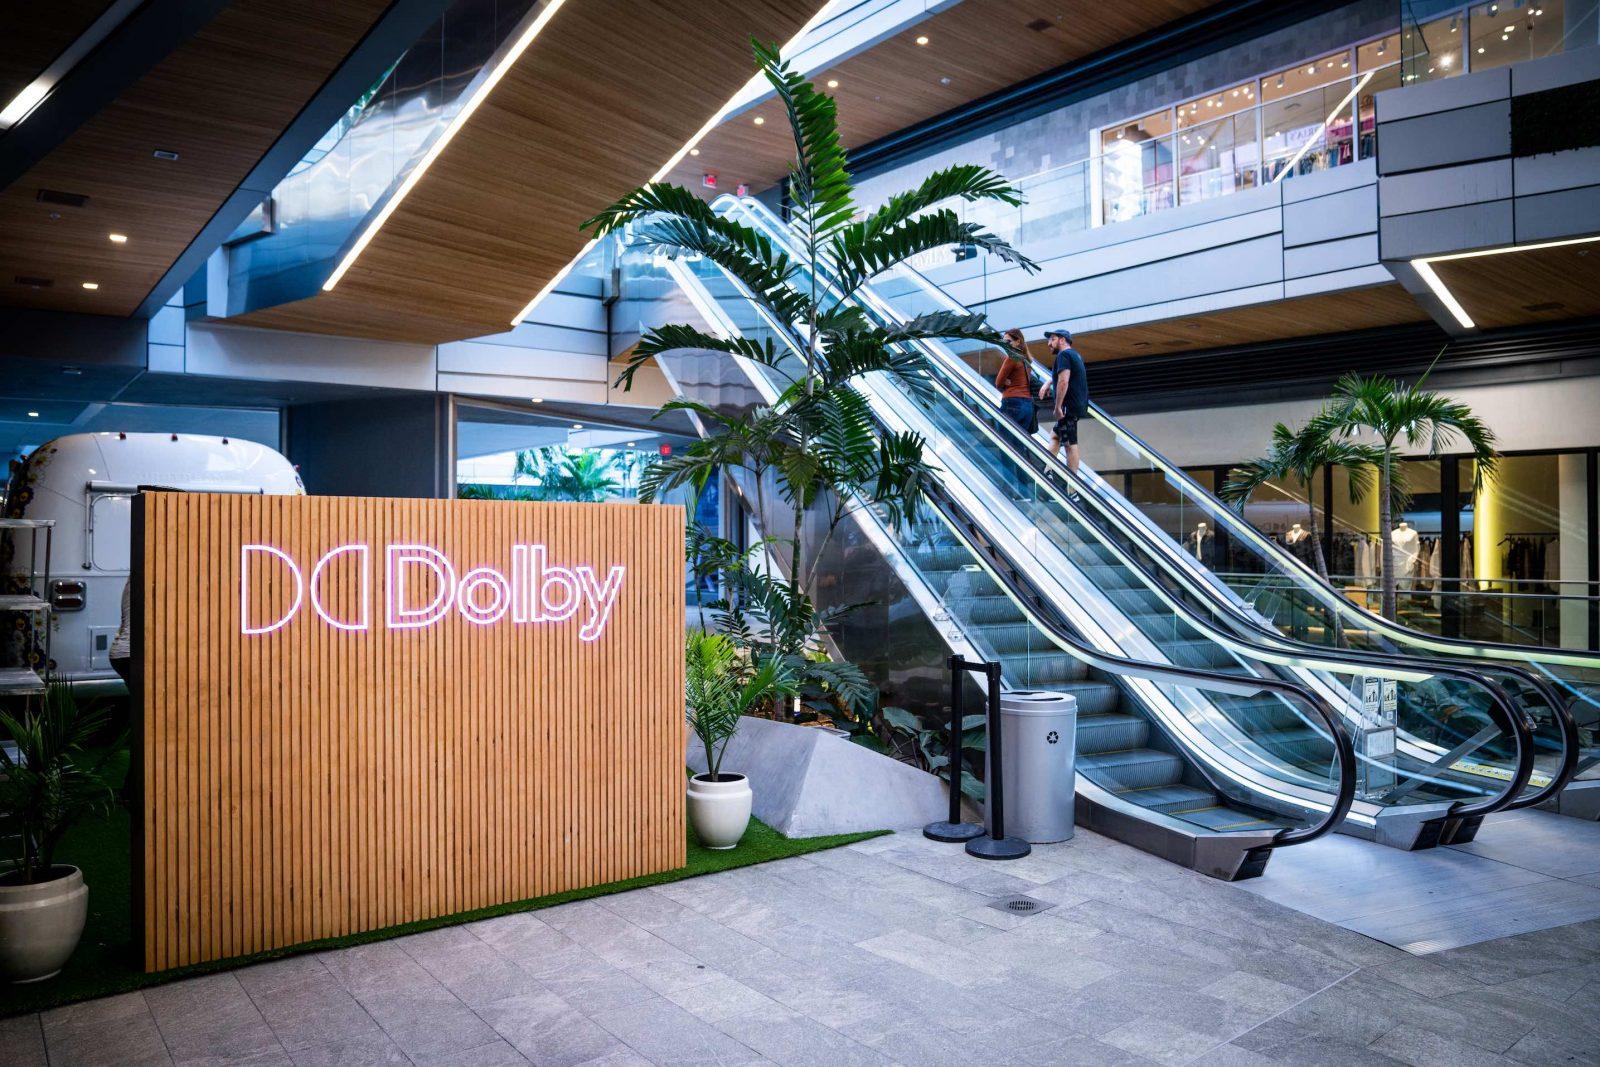 Dolby x Balvin